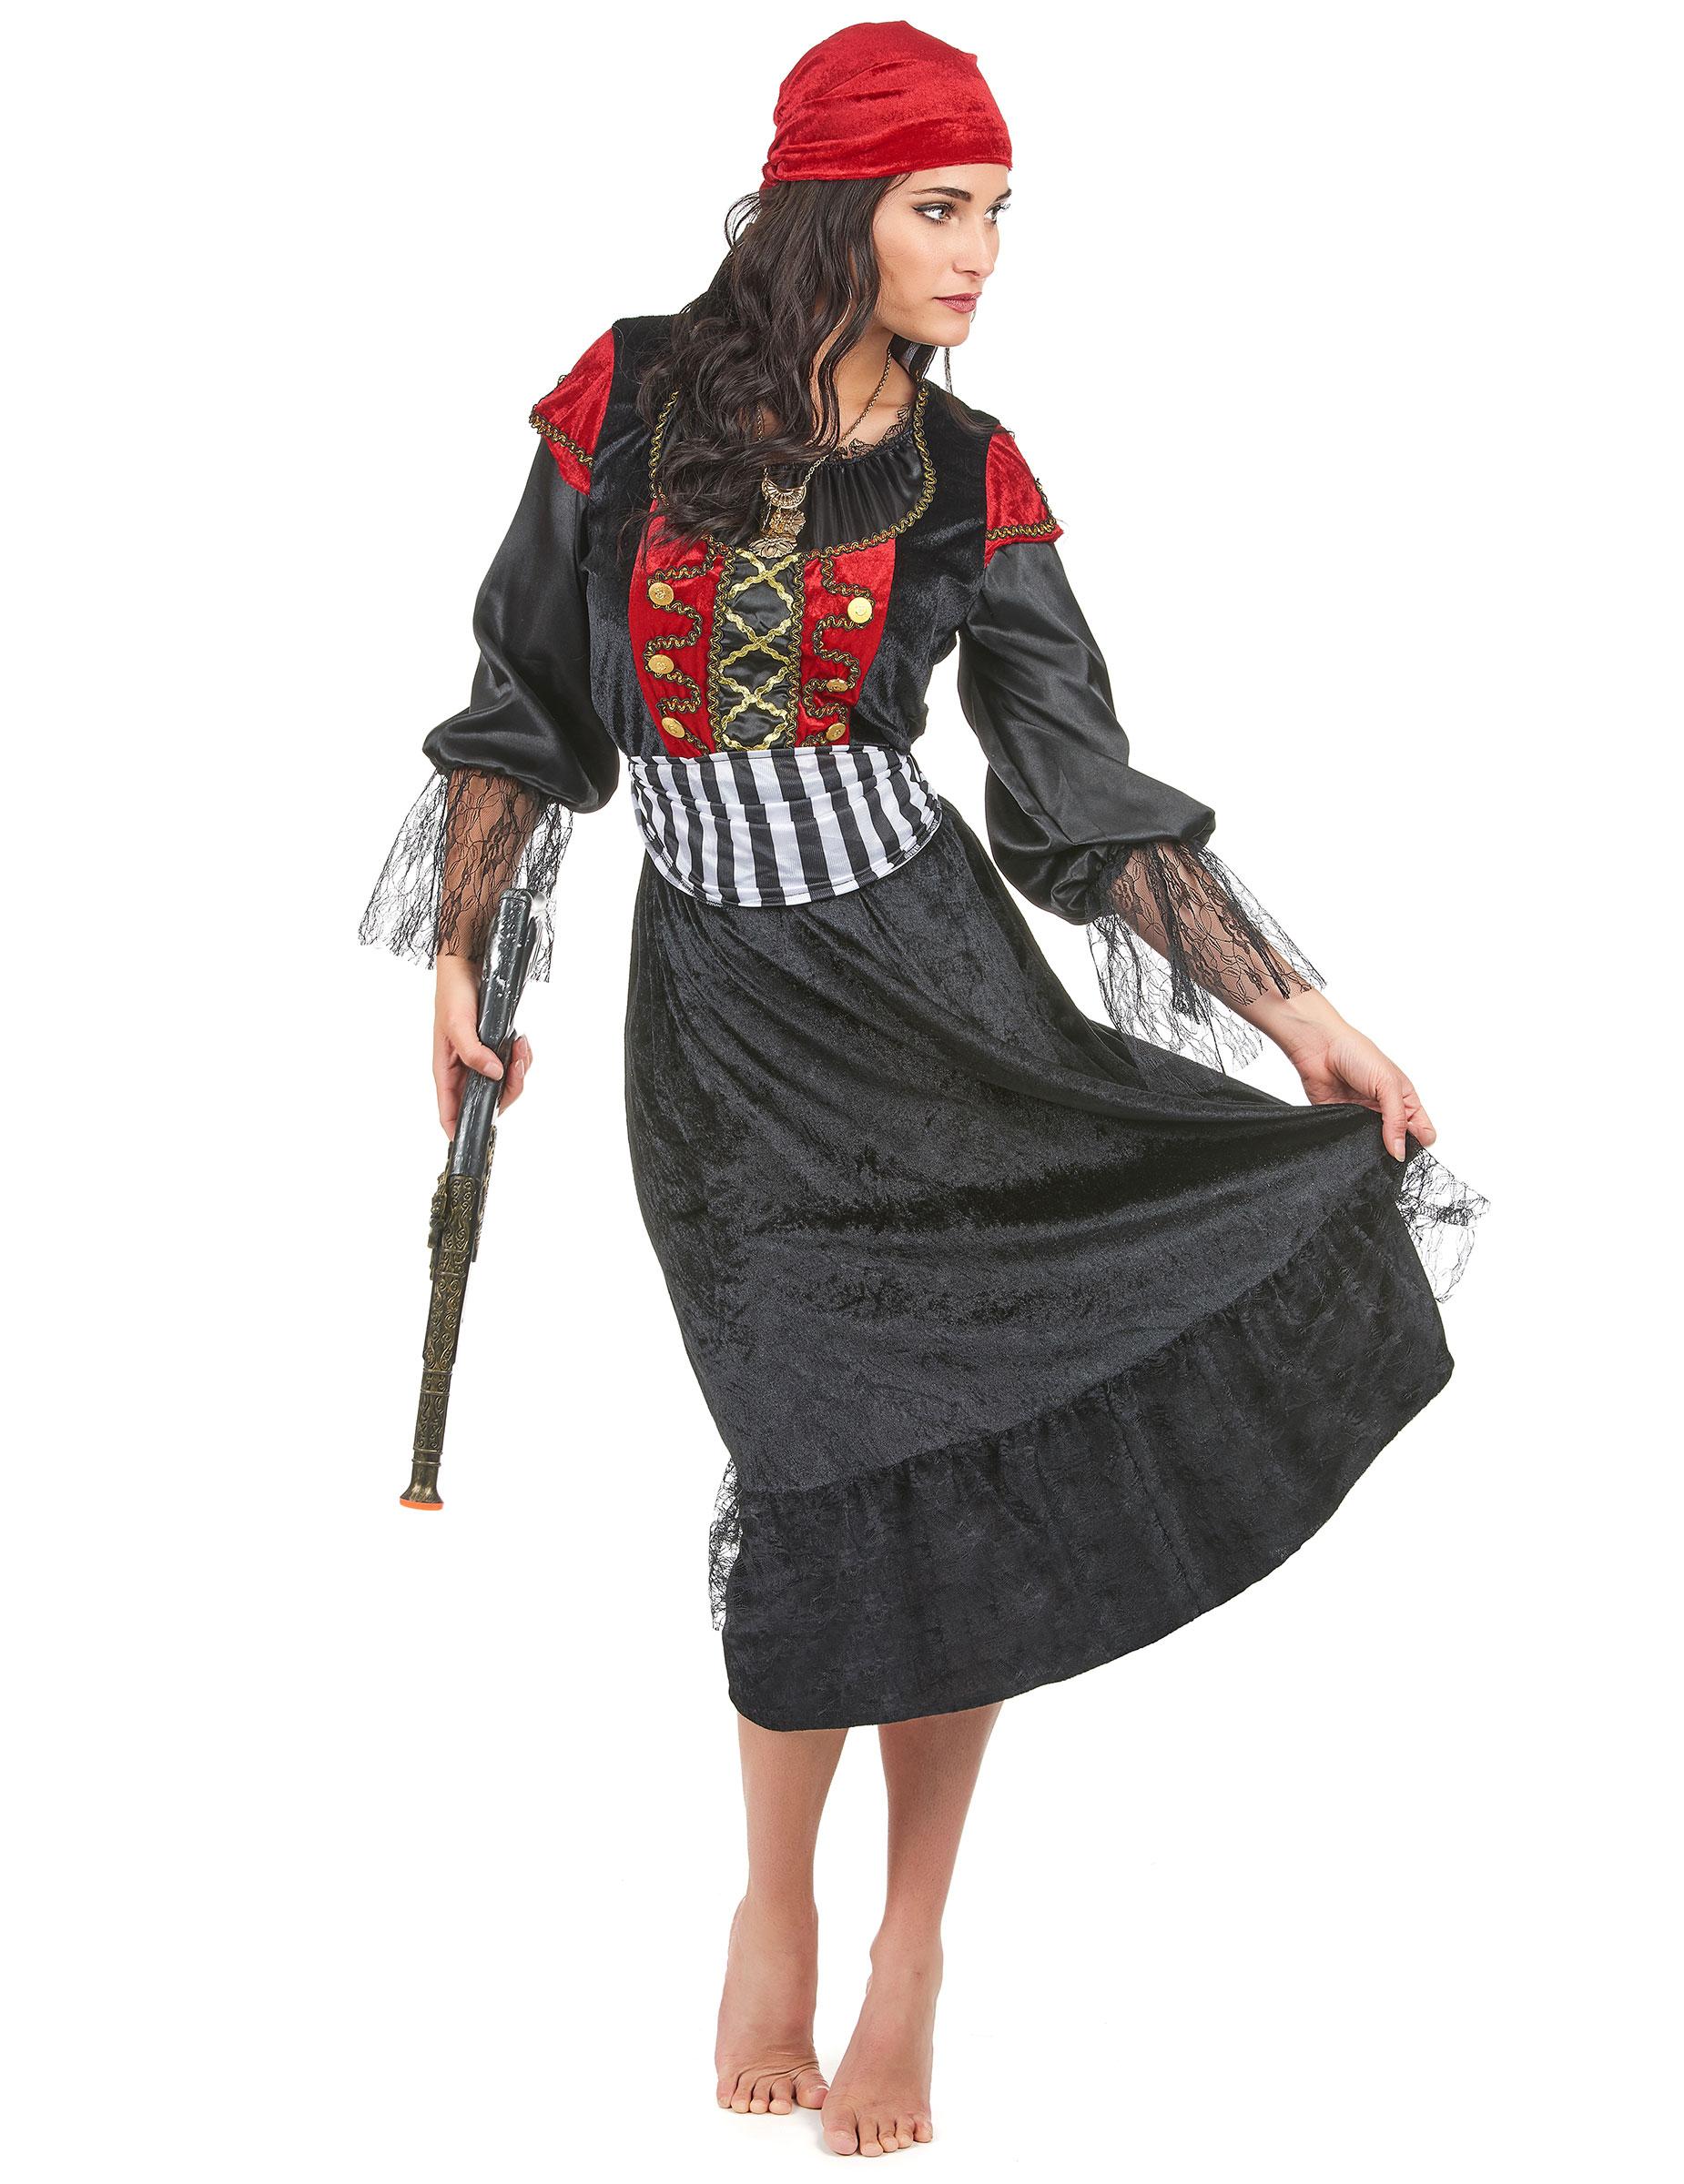 elegante piratin damenkost m schwarz rot gold g nstige faschings kost me bei karneval megastore. Black Bedroom Furniture Sets. Home Design Ideas